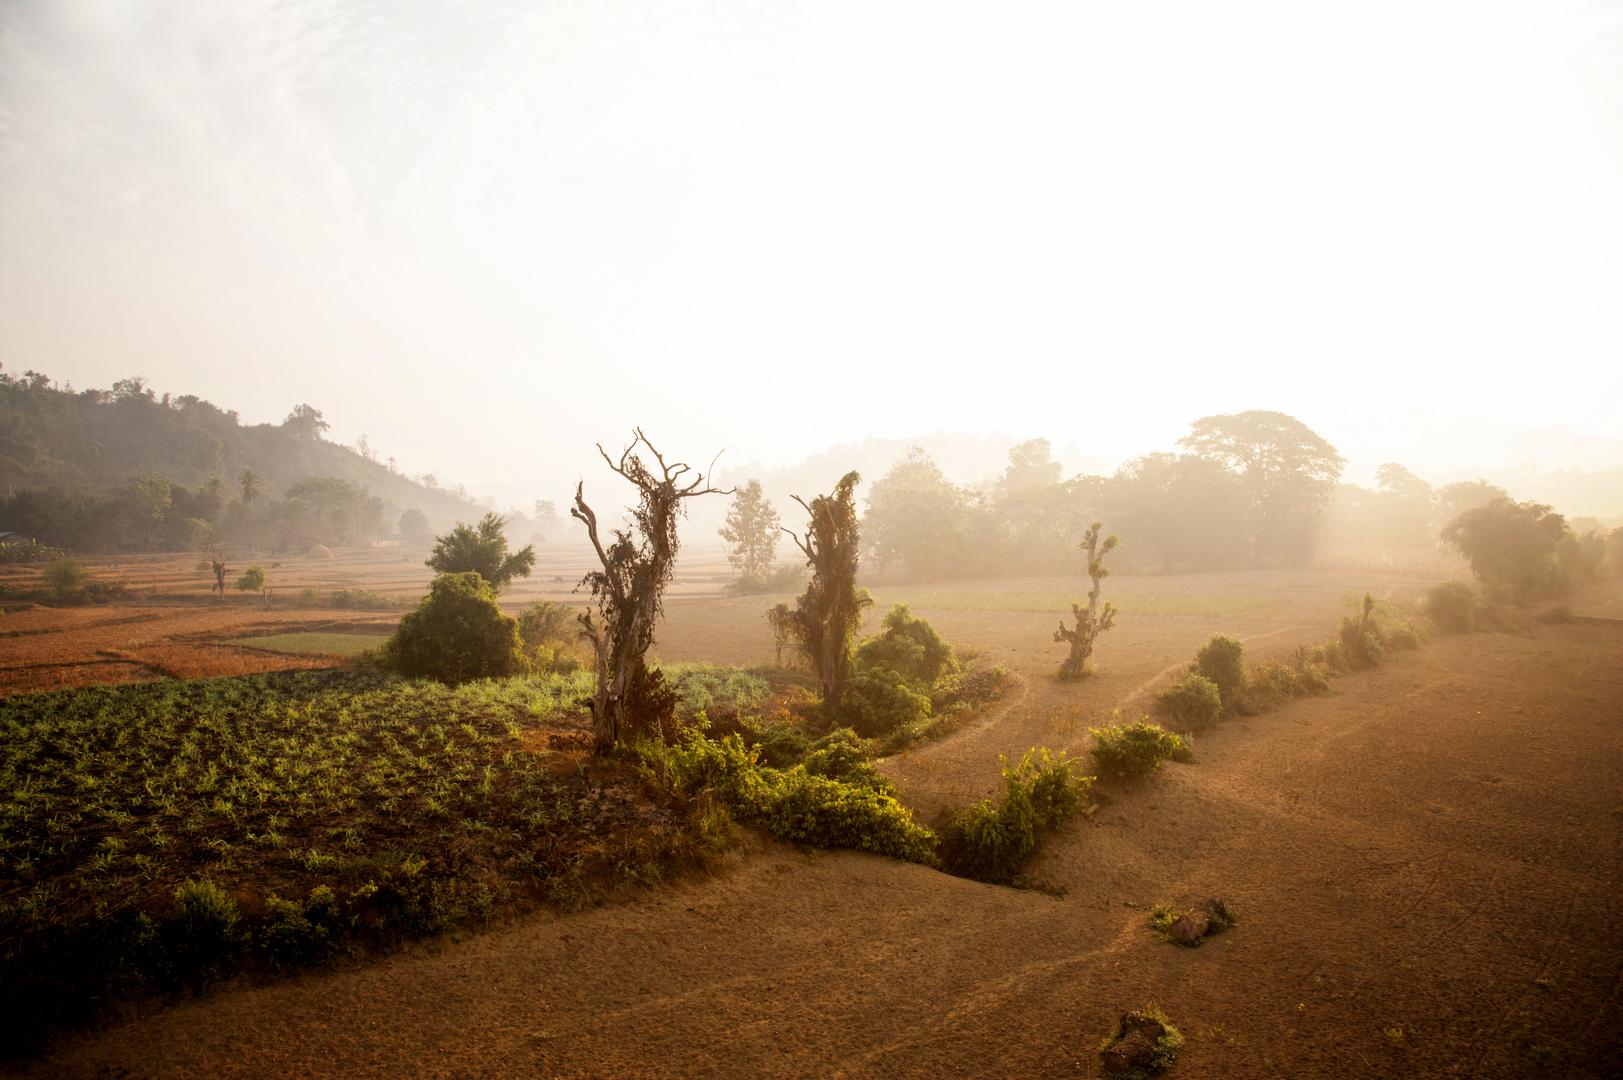 Morgennebel über Reisfeldern